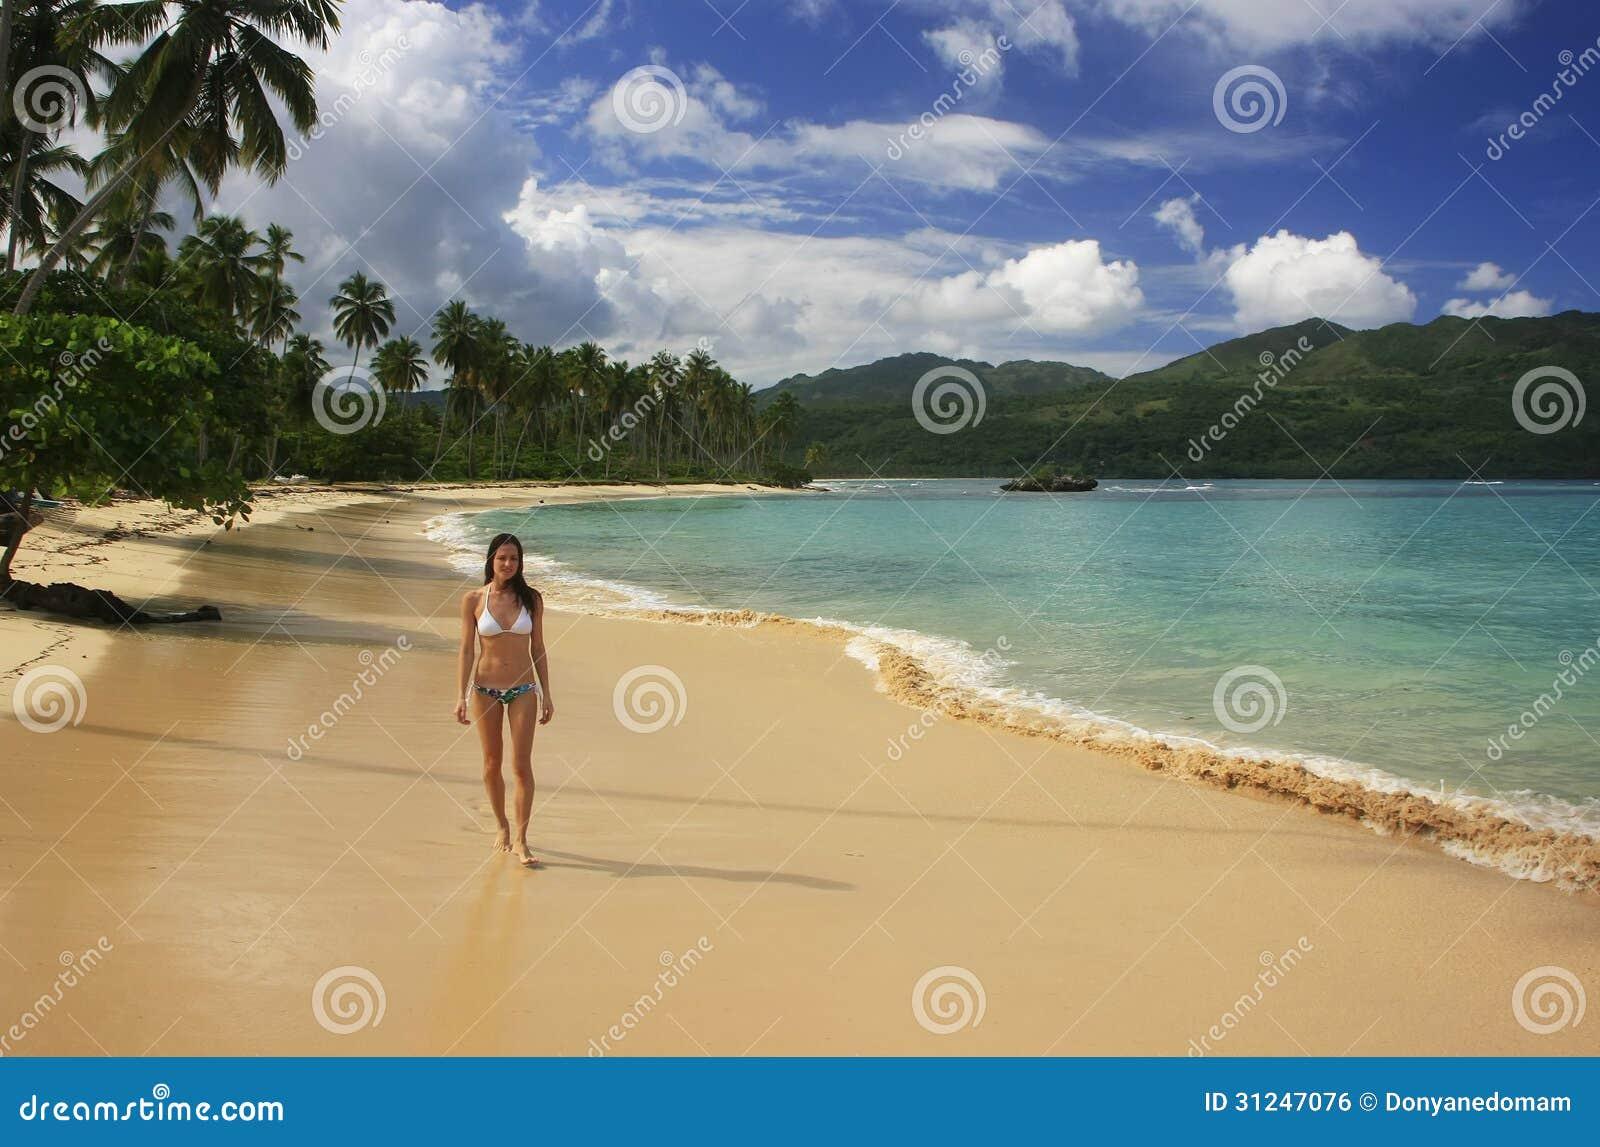 Young woman in bikini walking at Rincon beach, Samana peninsula